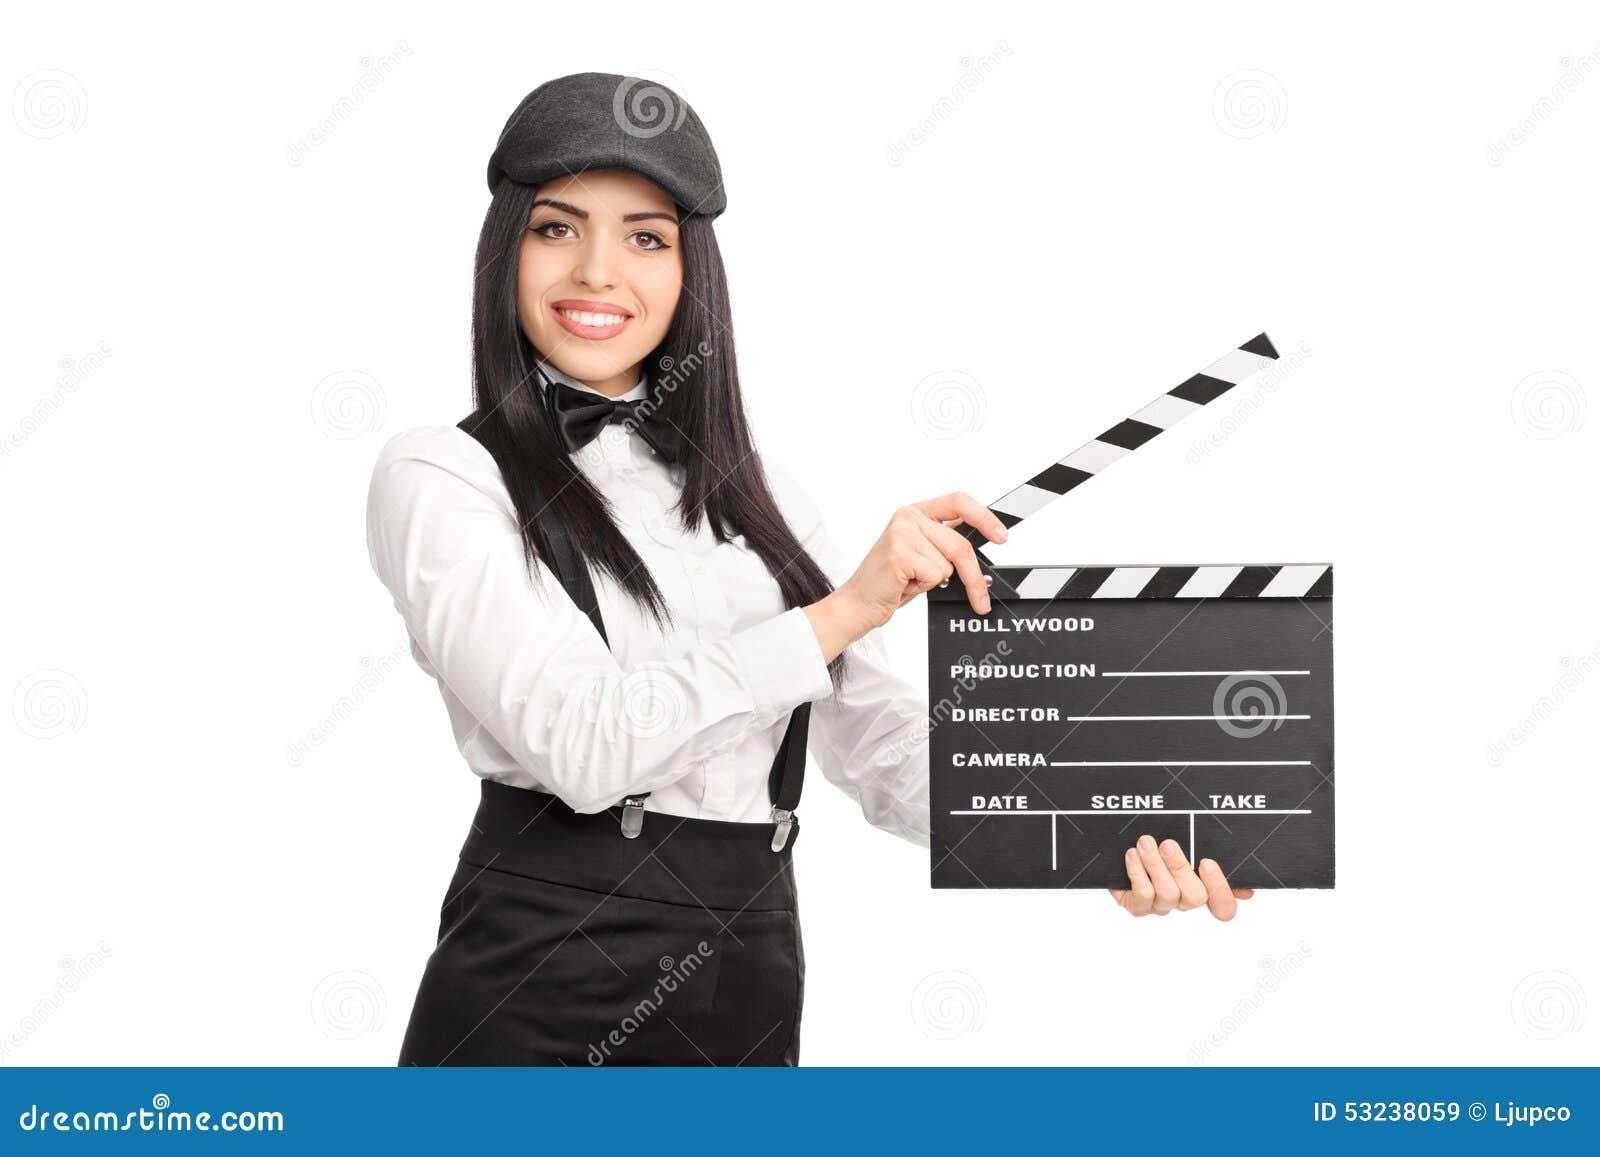 artistic female director holding a movie clapper board